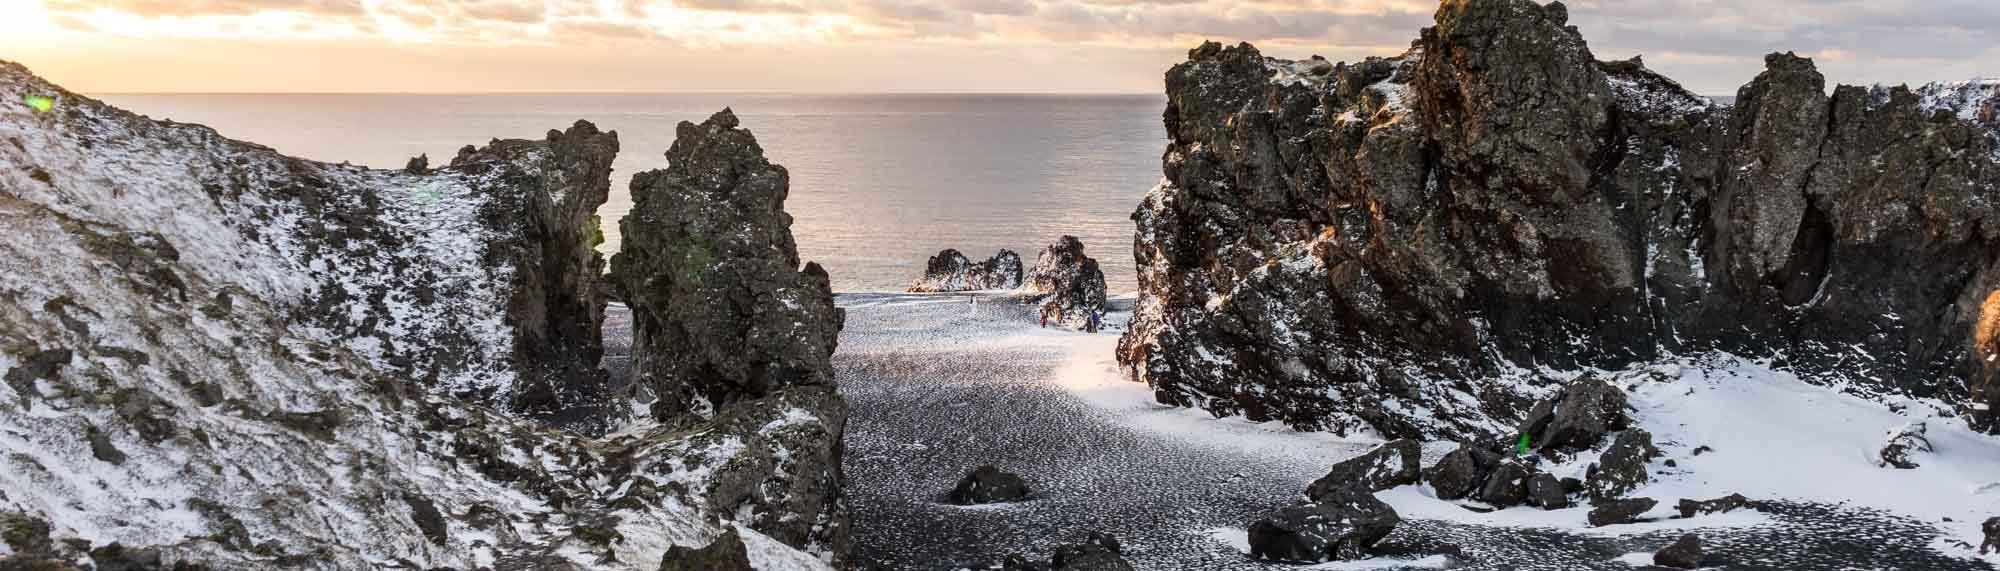 Une plage de la Péninsule de Snaefellsnes